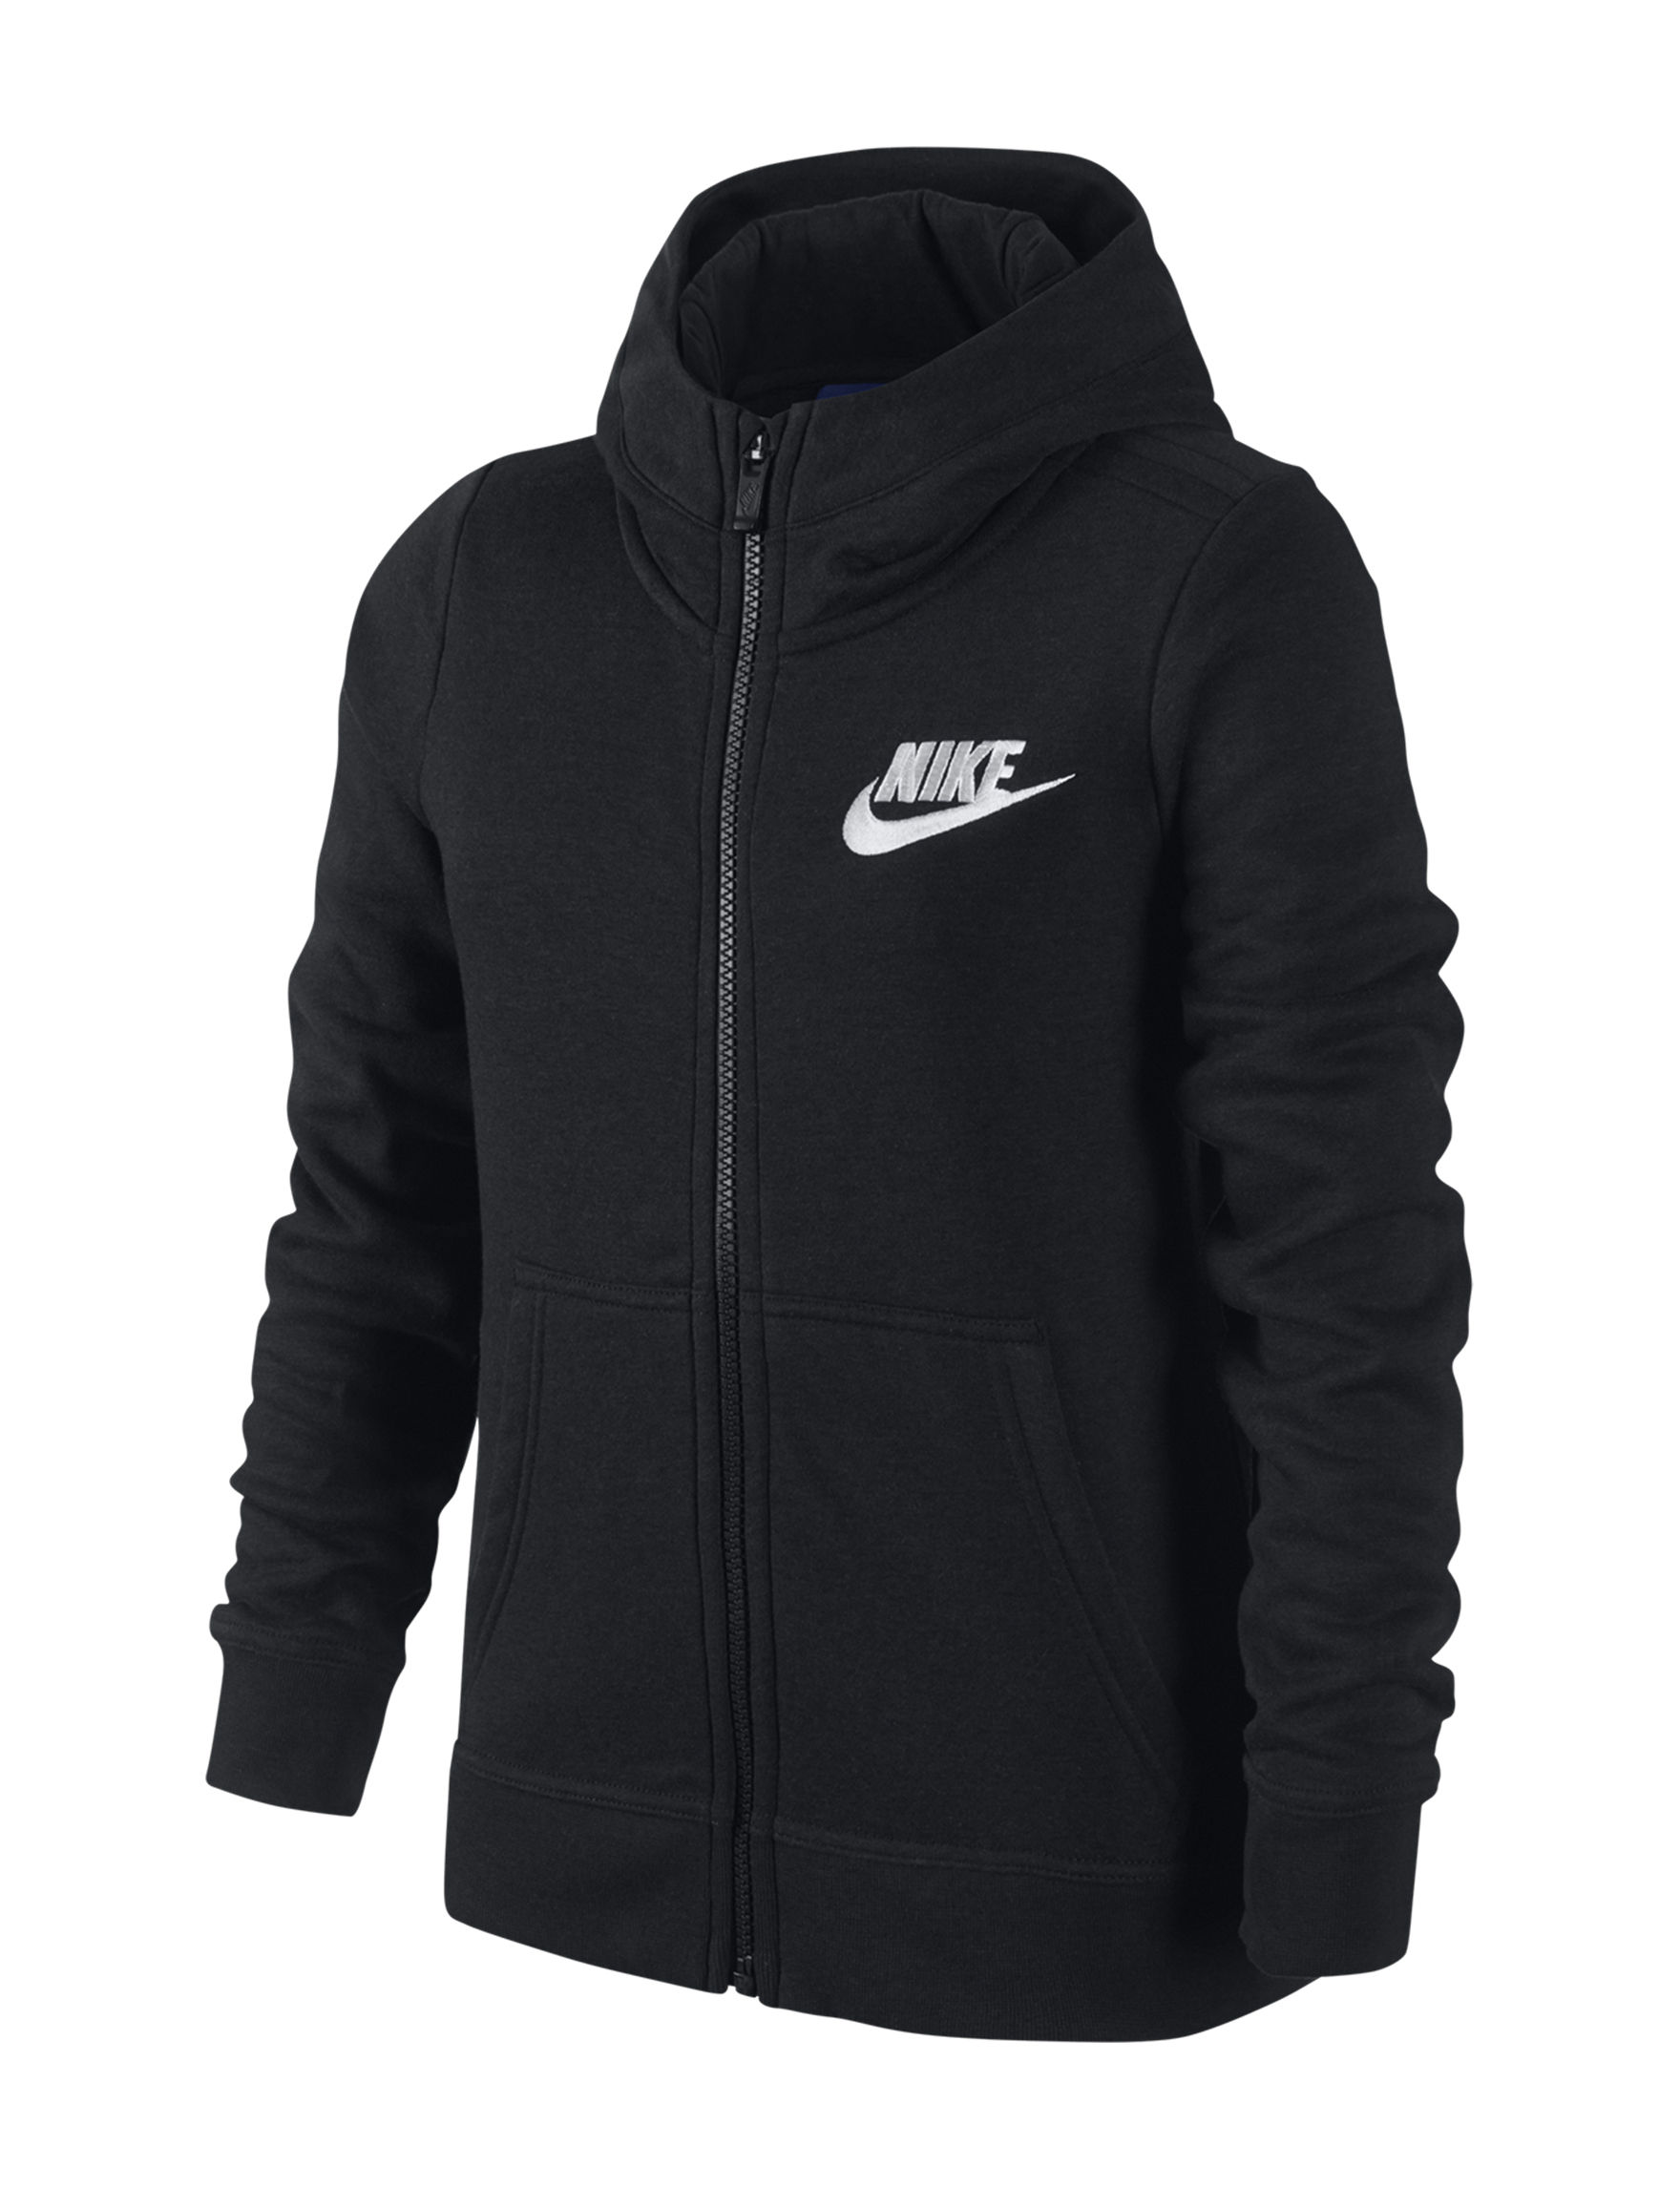 Nike Black Fleece & Soft Shell Jackets